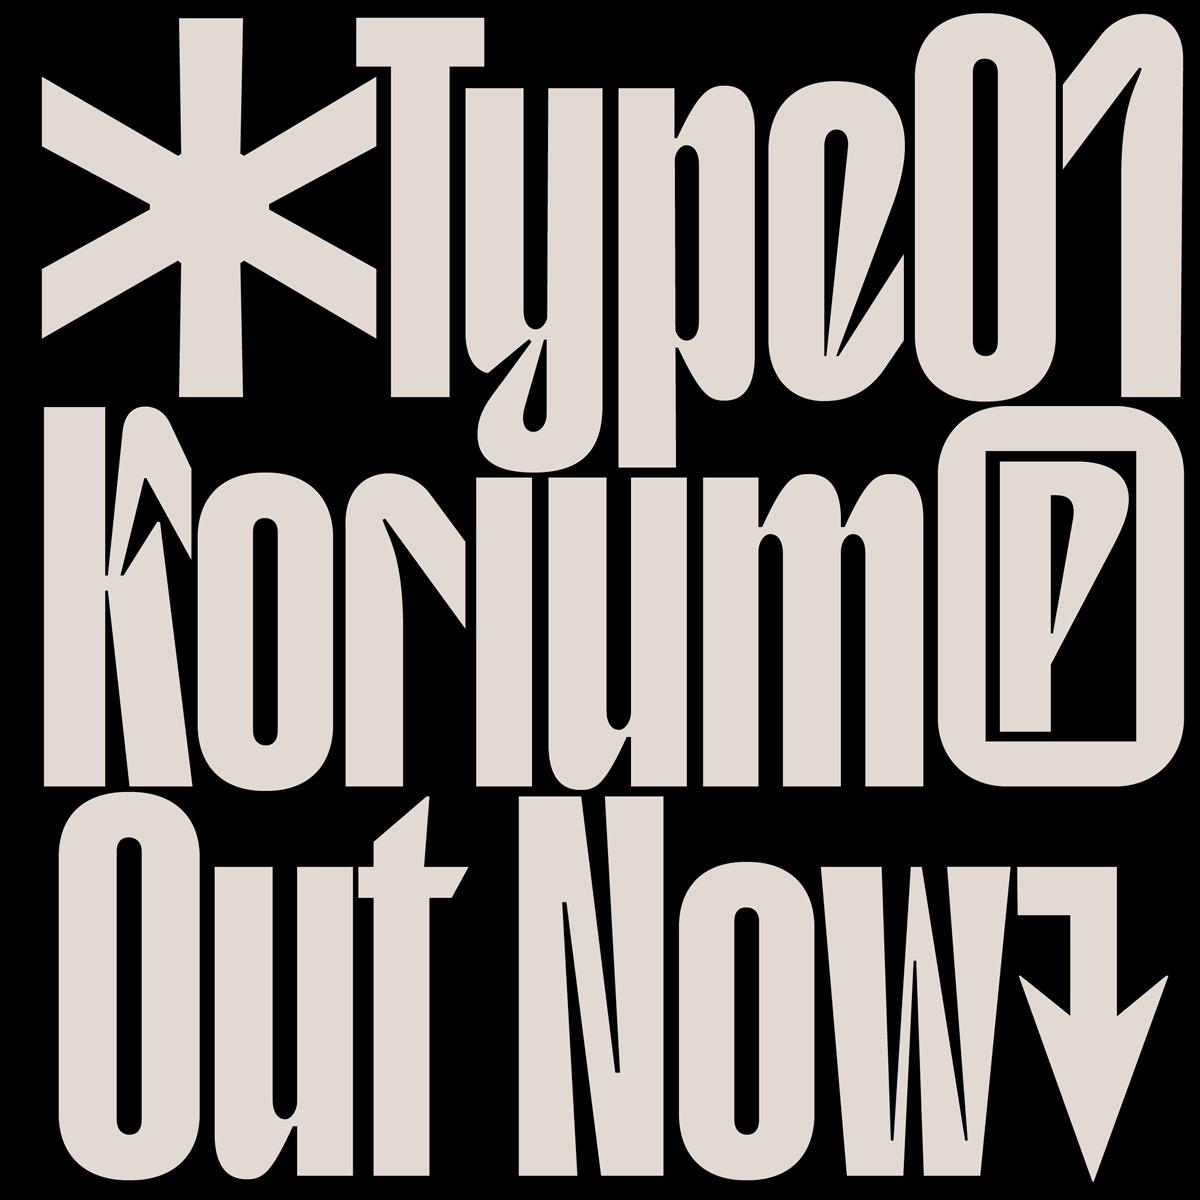 03 collide24 TYPE01 Valerio Monopoli - Valerio Monopoli and TYPE01 release their typeface Korium, a contemporary sans with angular shapes and a badass attitude